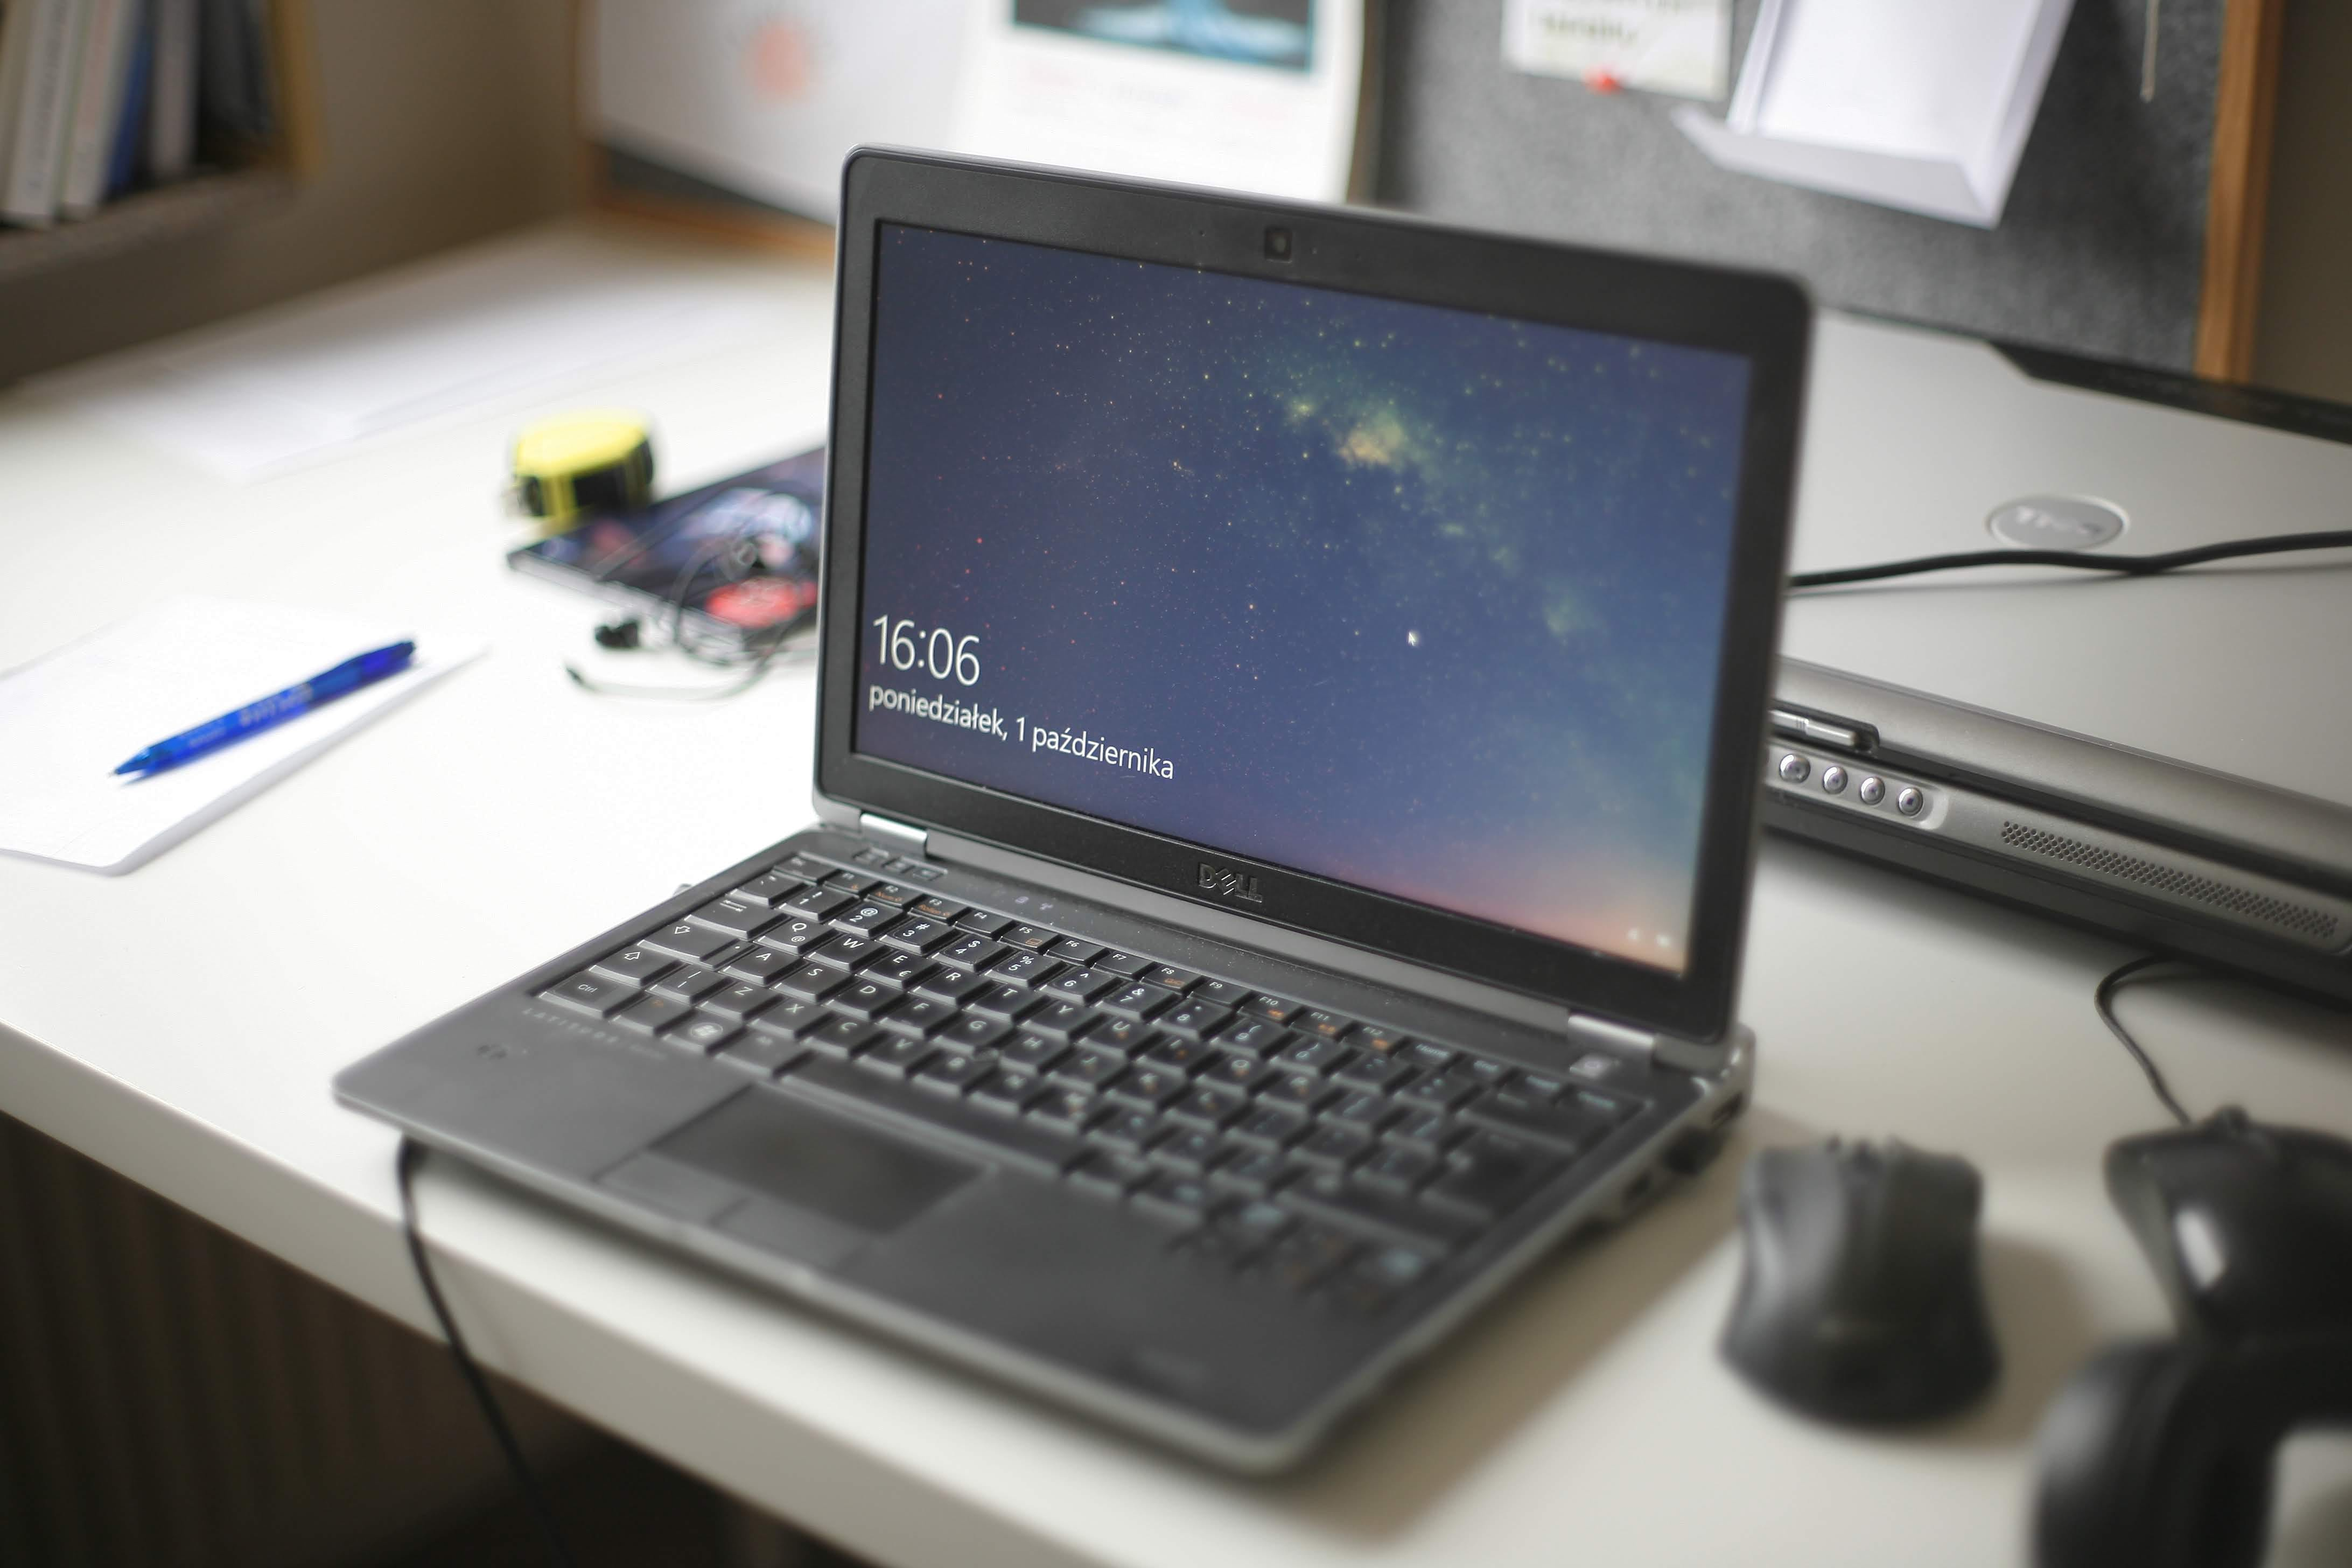 bærbar computer, mockup, notesbog